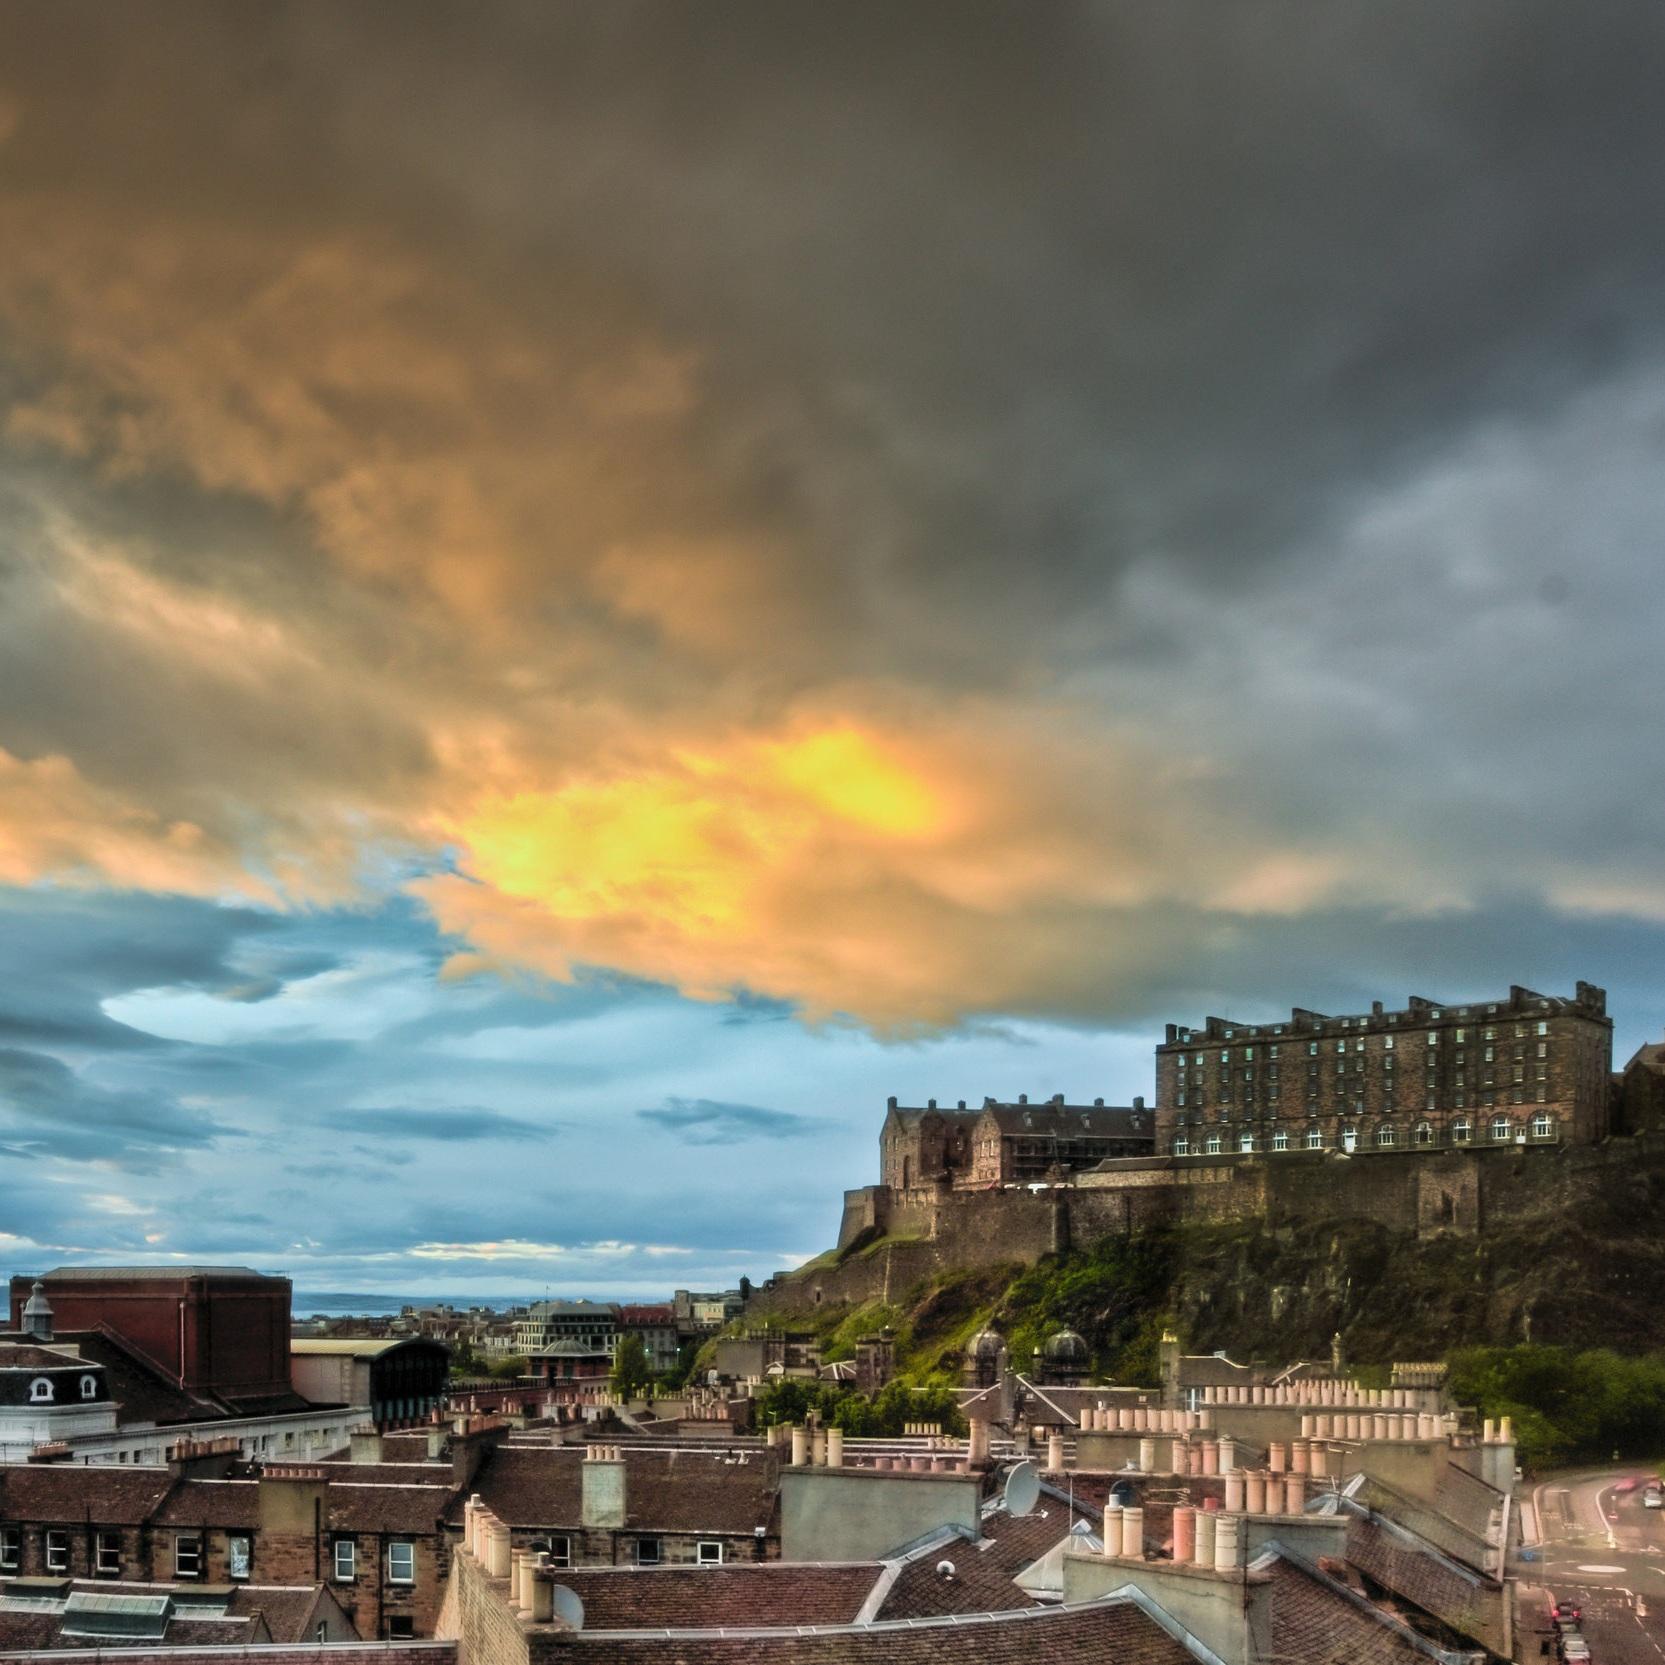 Sky bar edinburgh castle_no_stamp.jpg